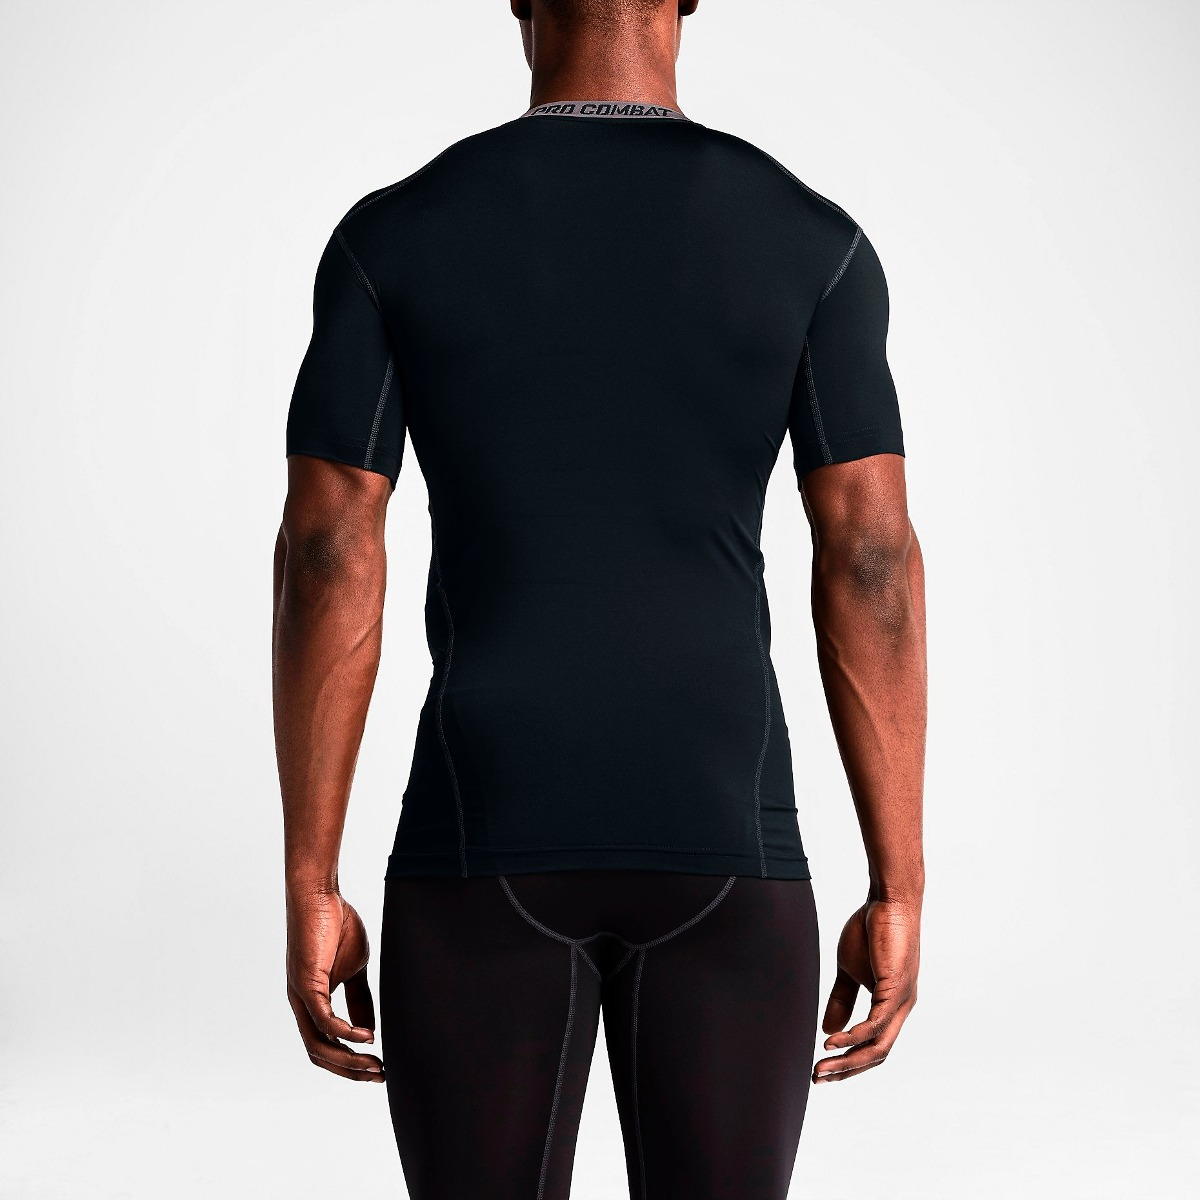 80b016f95f camiseta térmica nike pro combat compressão - g - v2mshop. Carregando zoom.